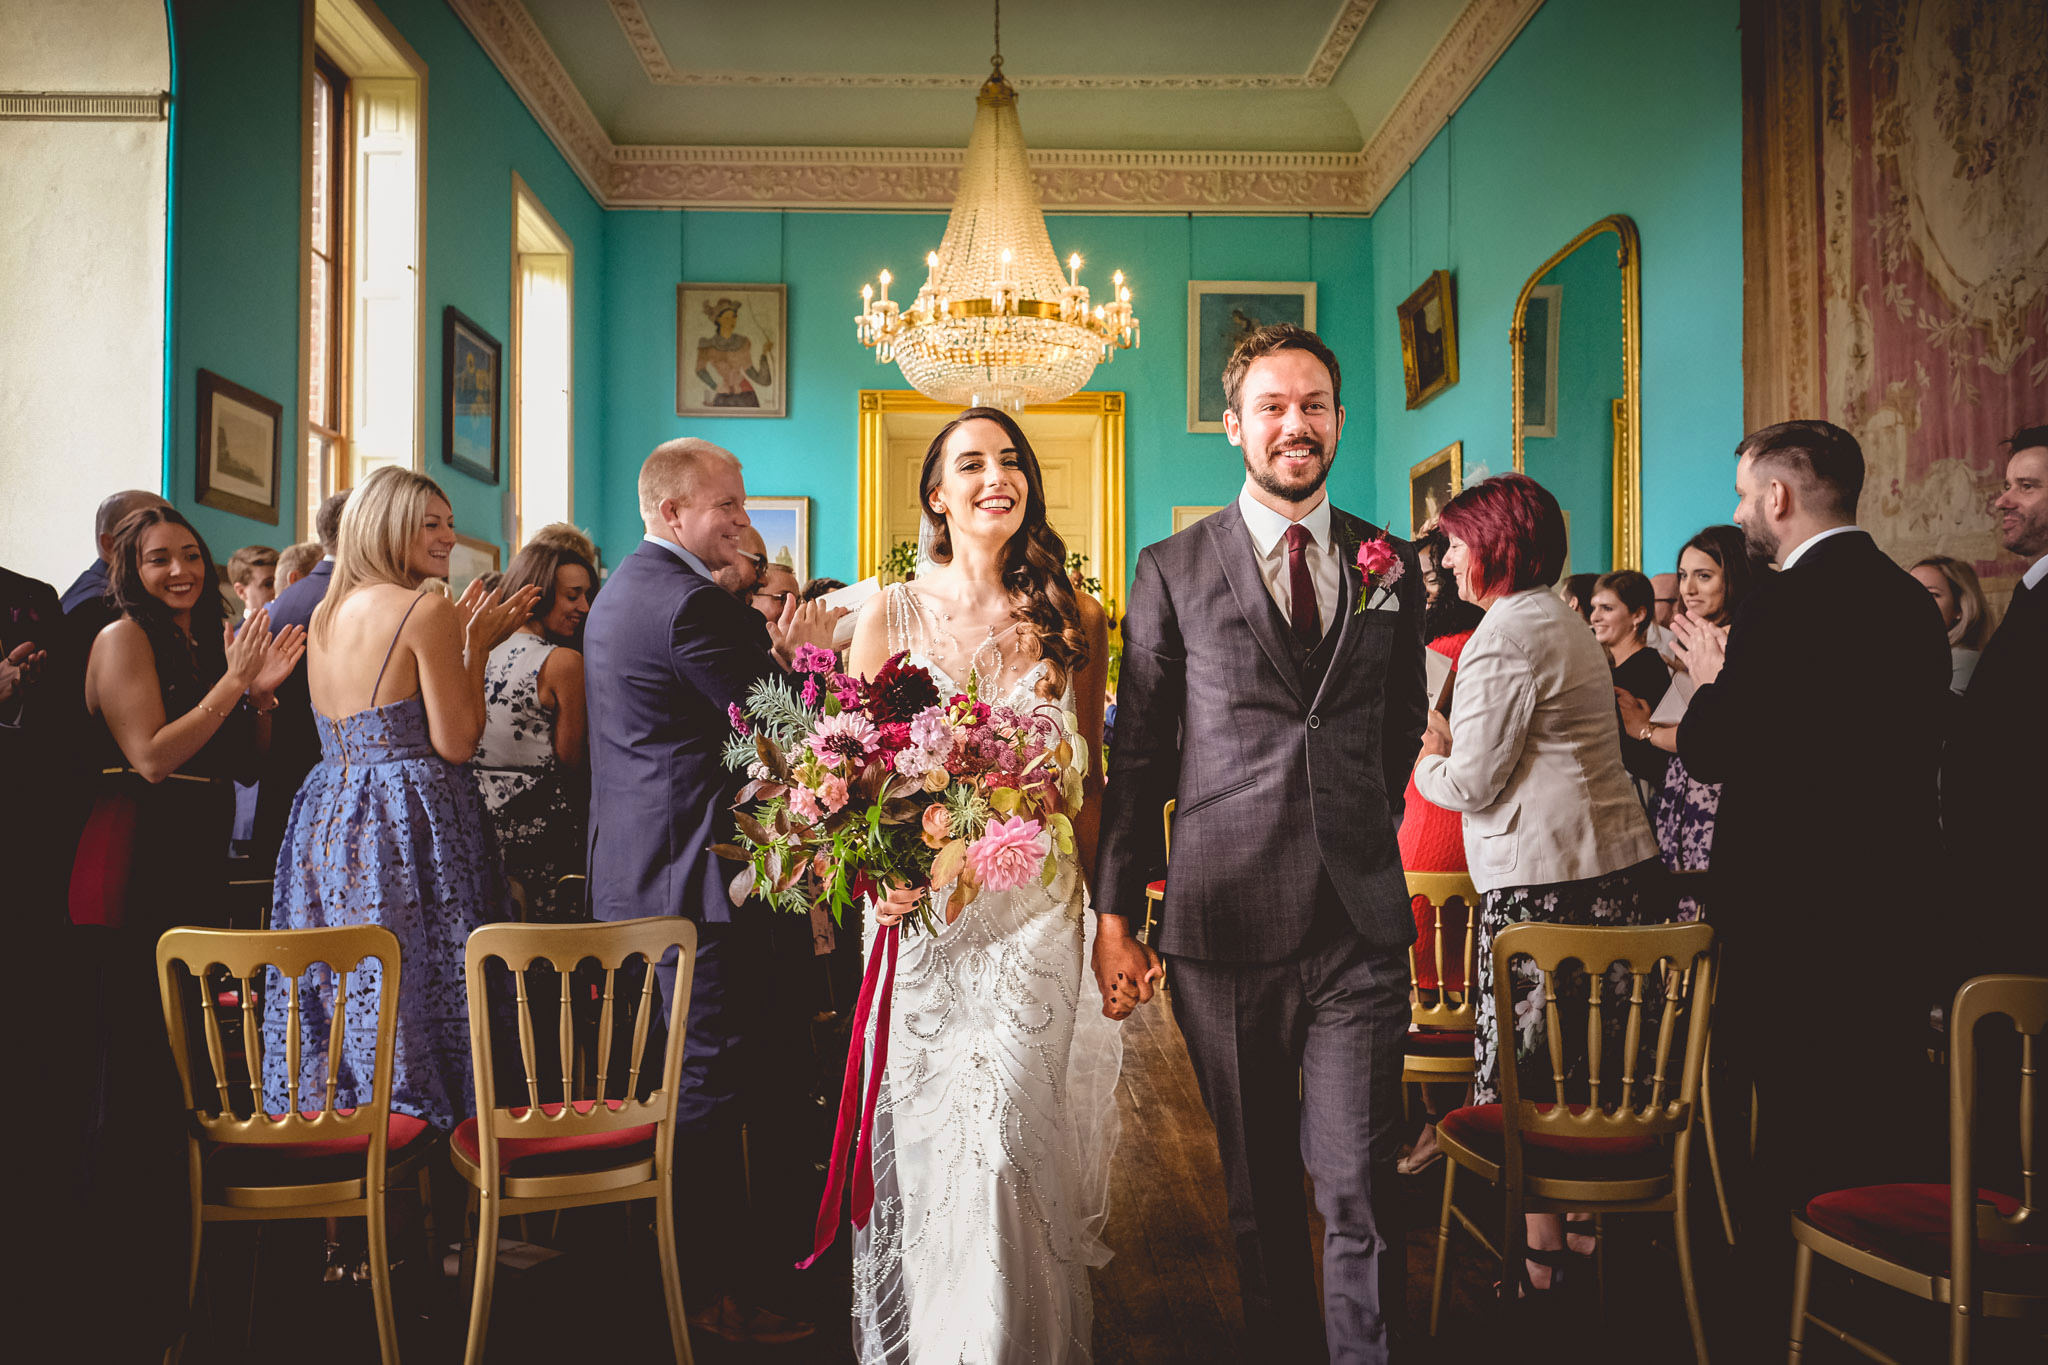 Walcot Hall Ceremony room - photo by Andrew Billington Photography